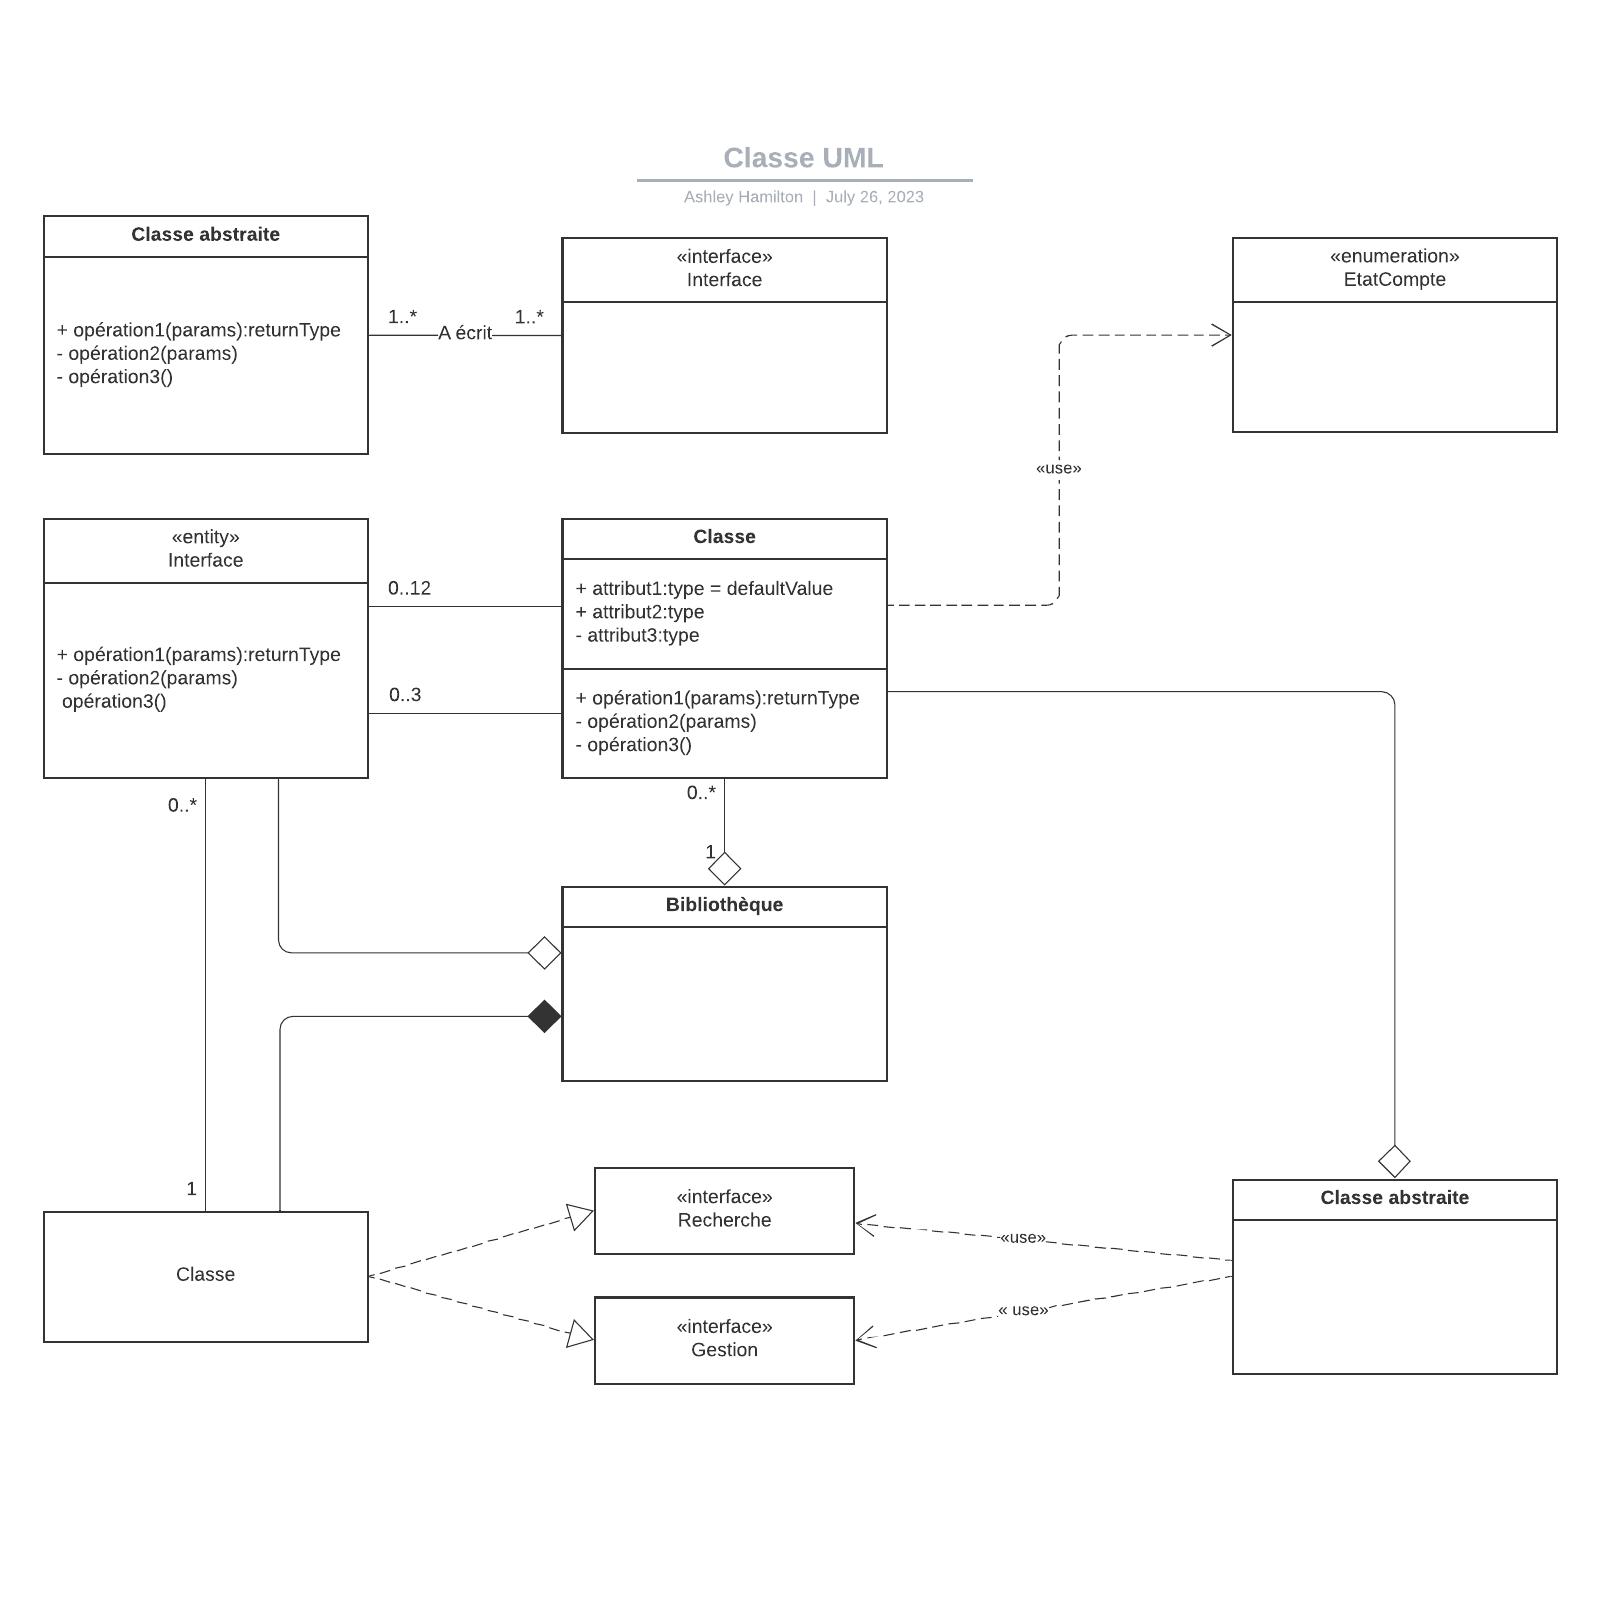 exemple de diagramme de classes UML